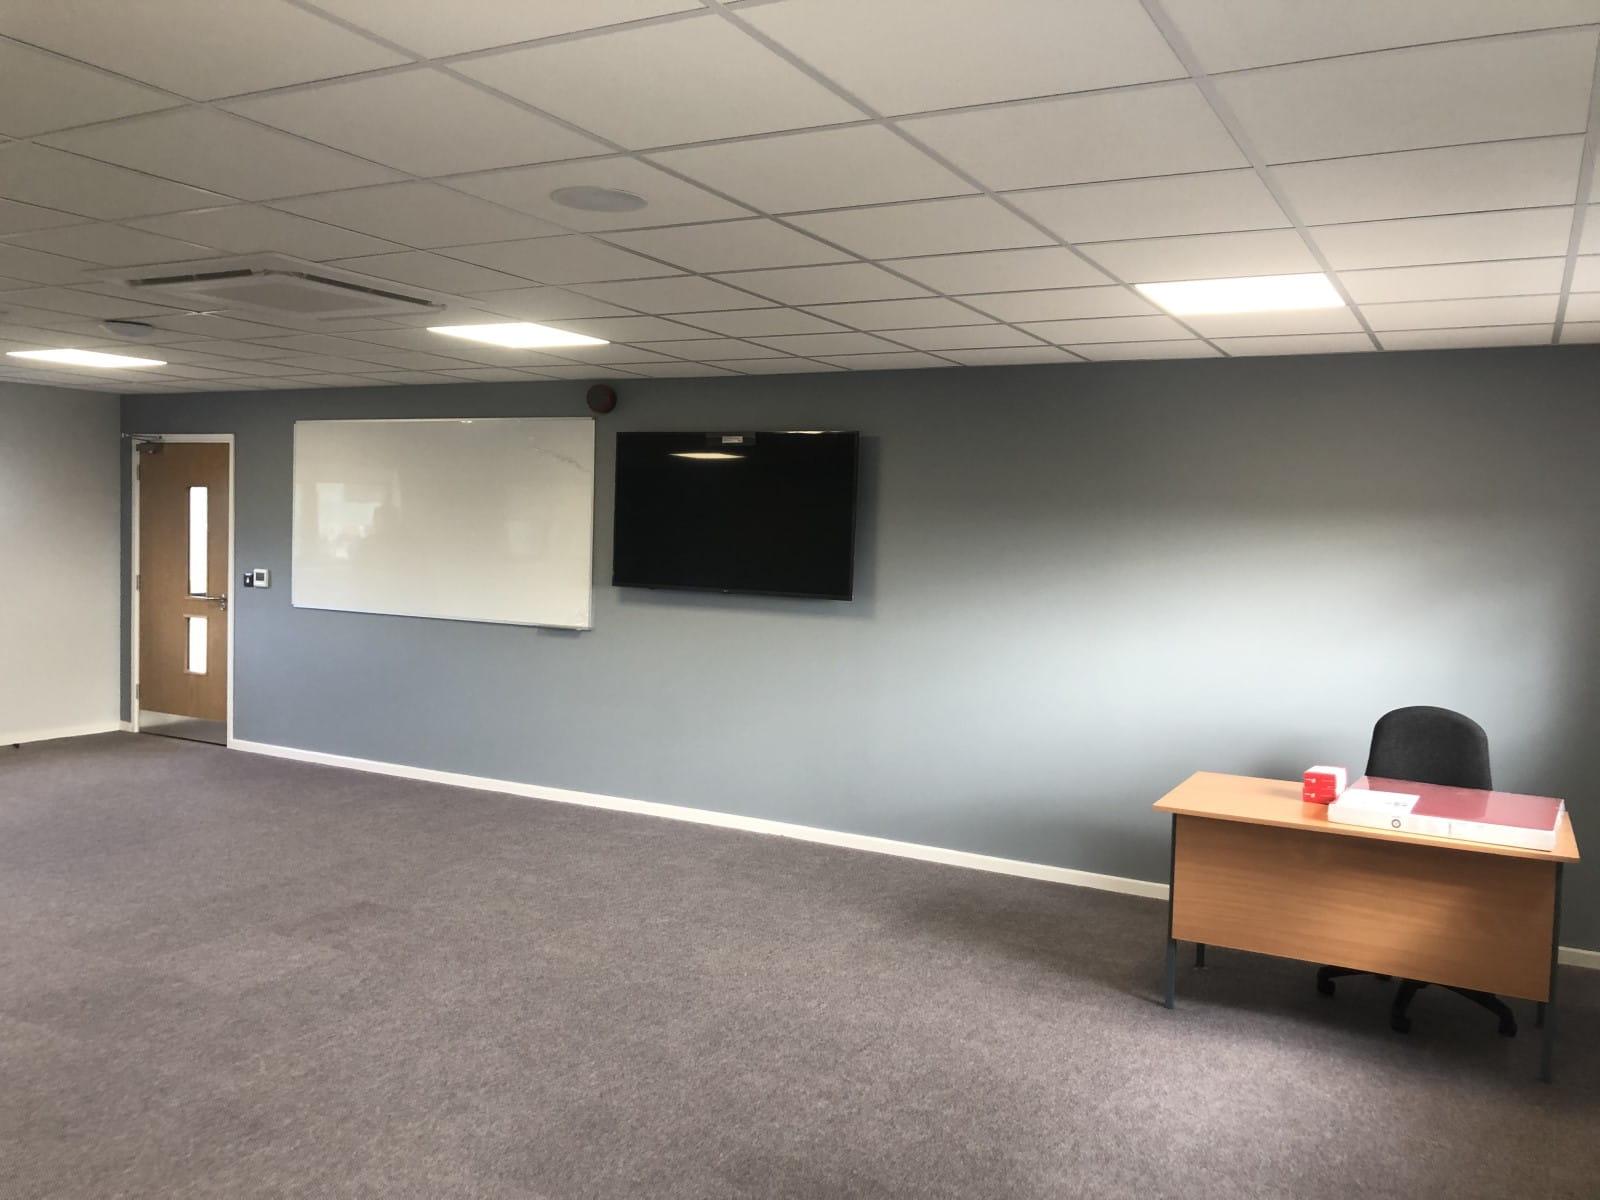 Wollaston School Modular Extension Internal -Northamptonshire, Midlands